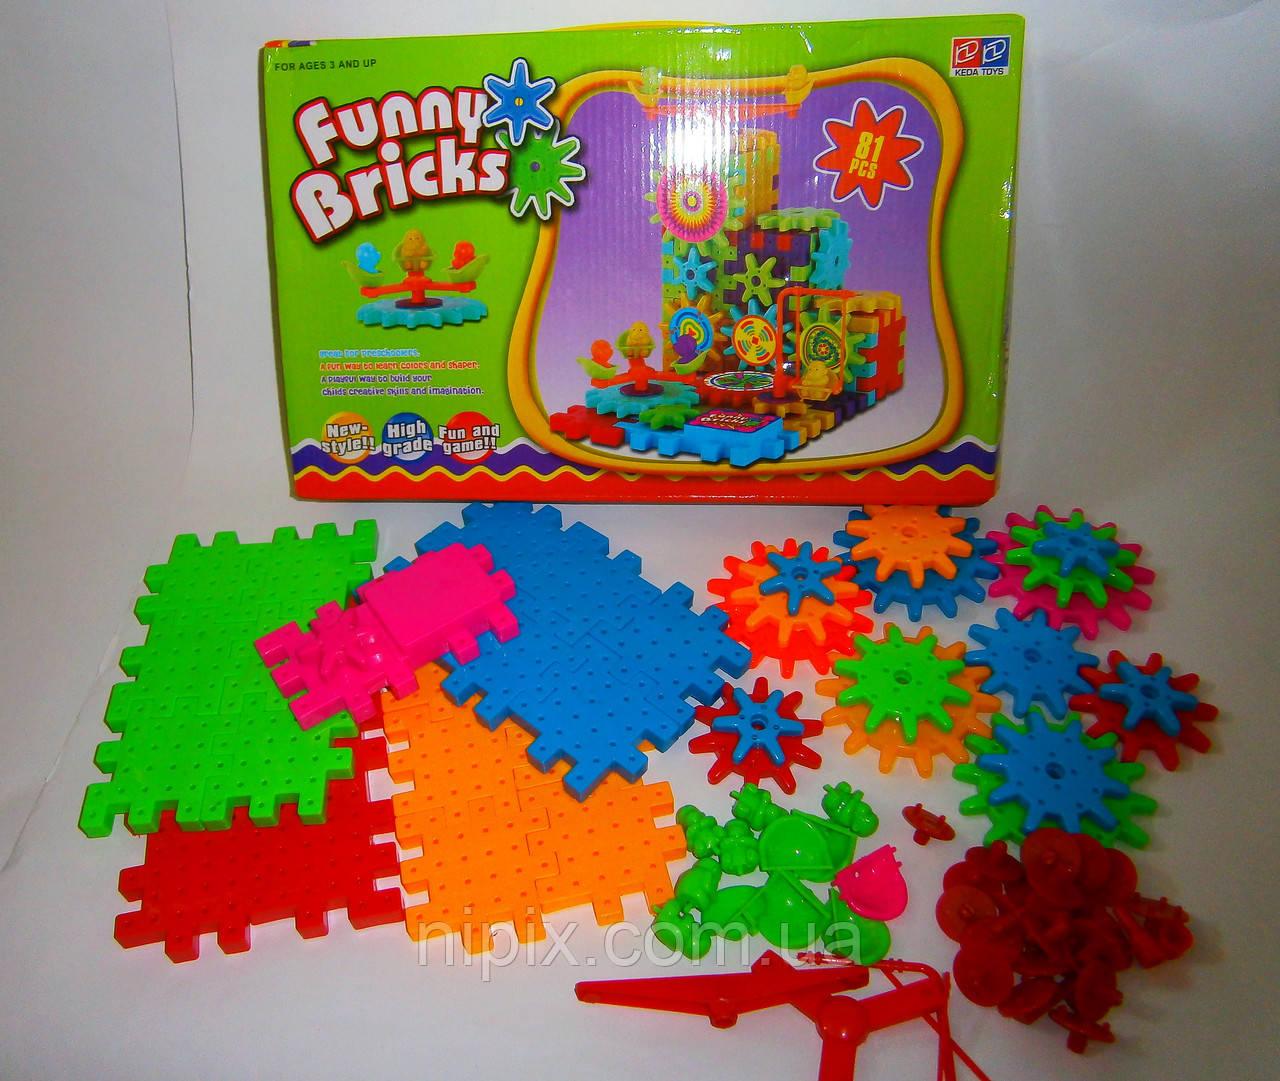 Детский развивающий, вращающийся 3D  конструктор Фанни Брикс (Funny Bricks)